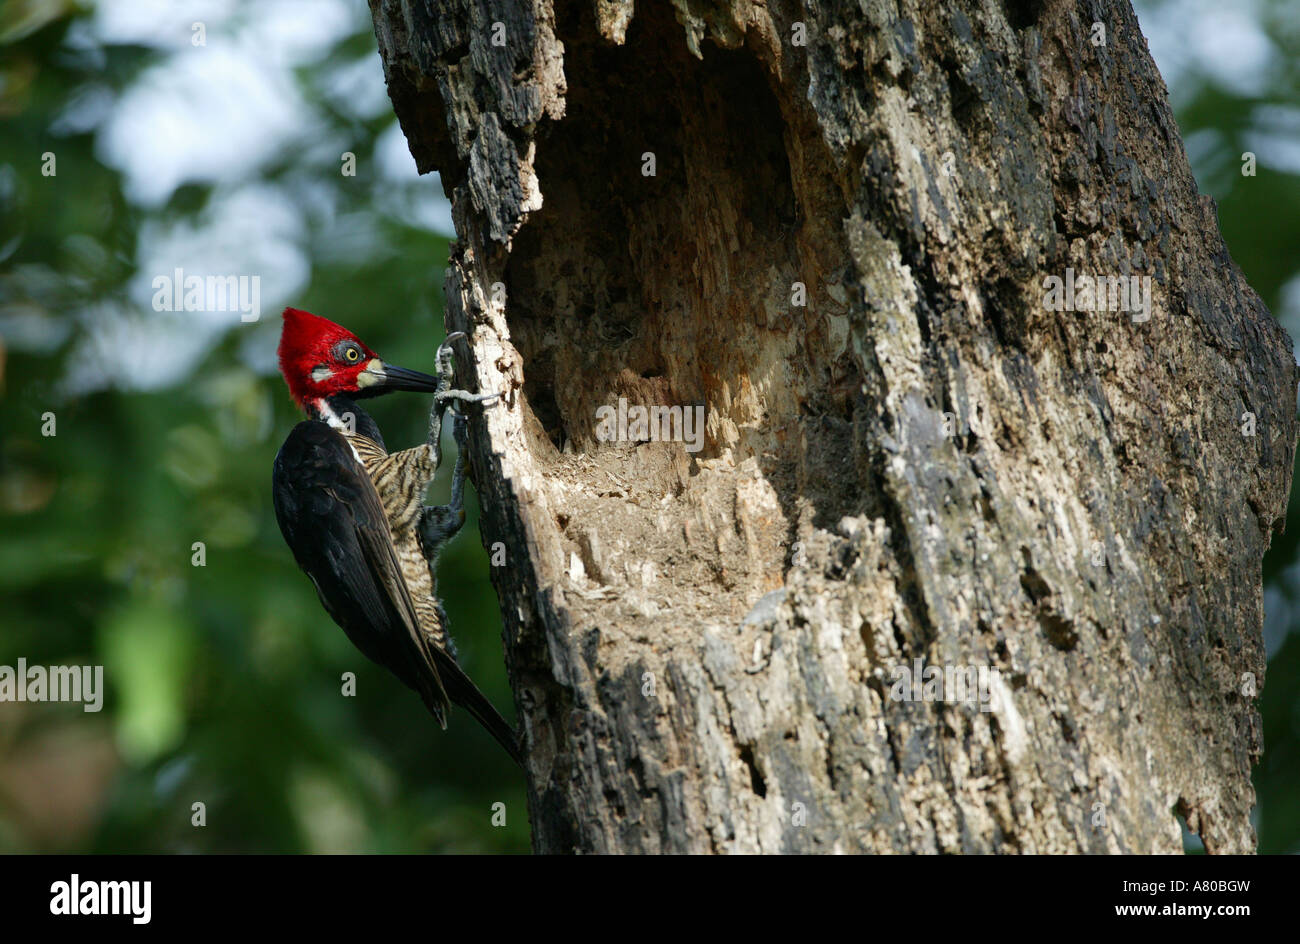 Crimson-crested Woodpecker in Metropolitan park, Republic of Panama. - Stock Image